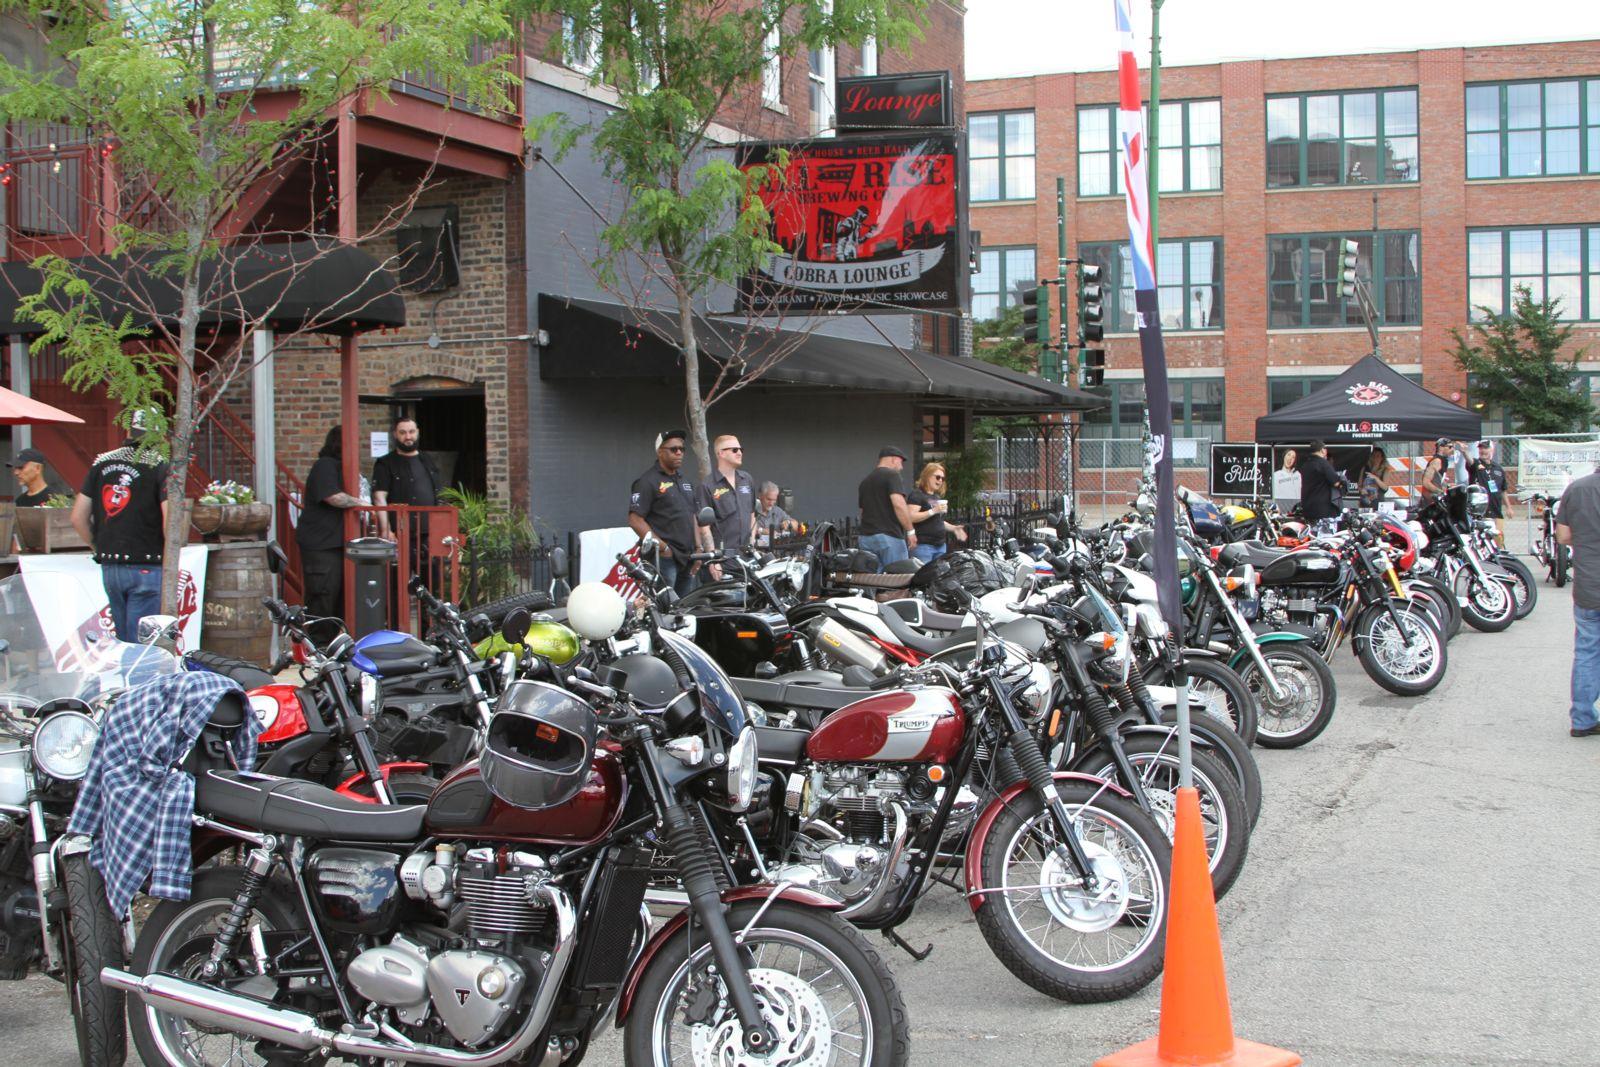 Big row of motorcycles